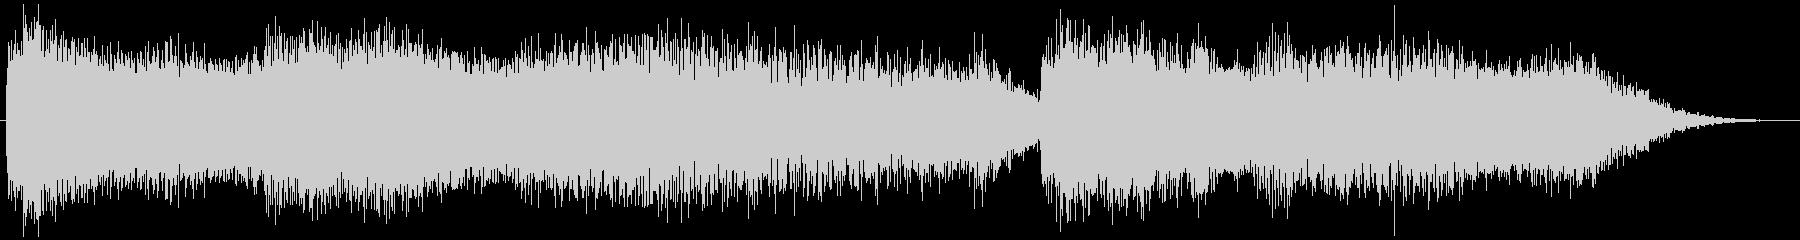 PADS 圧力降下01の未再生の波形